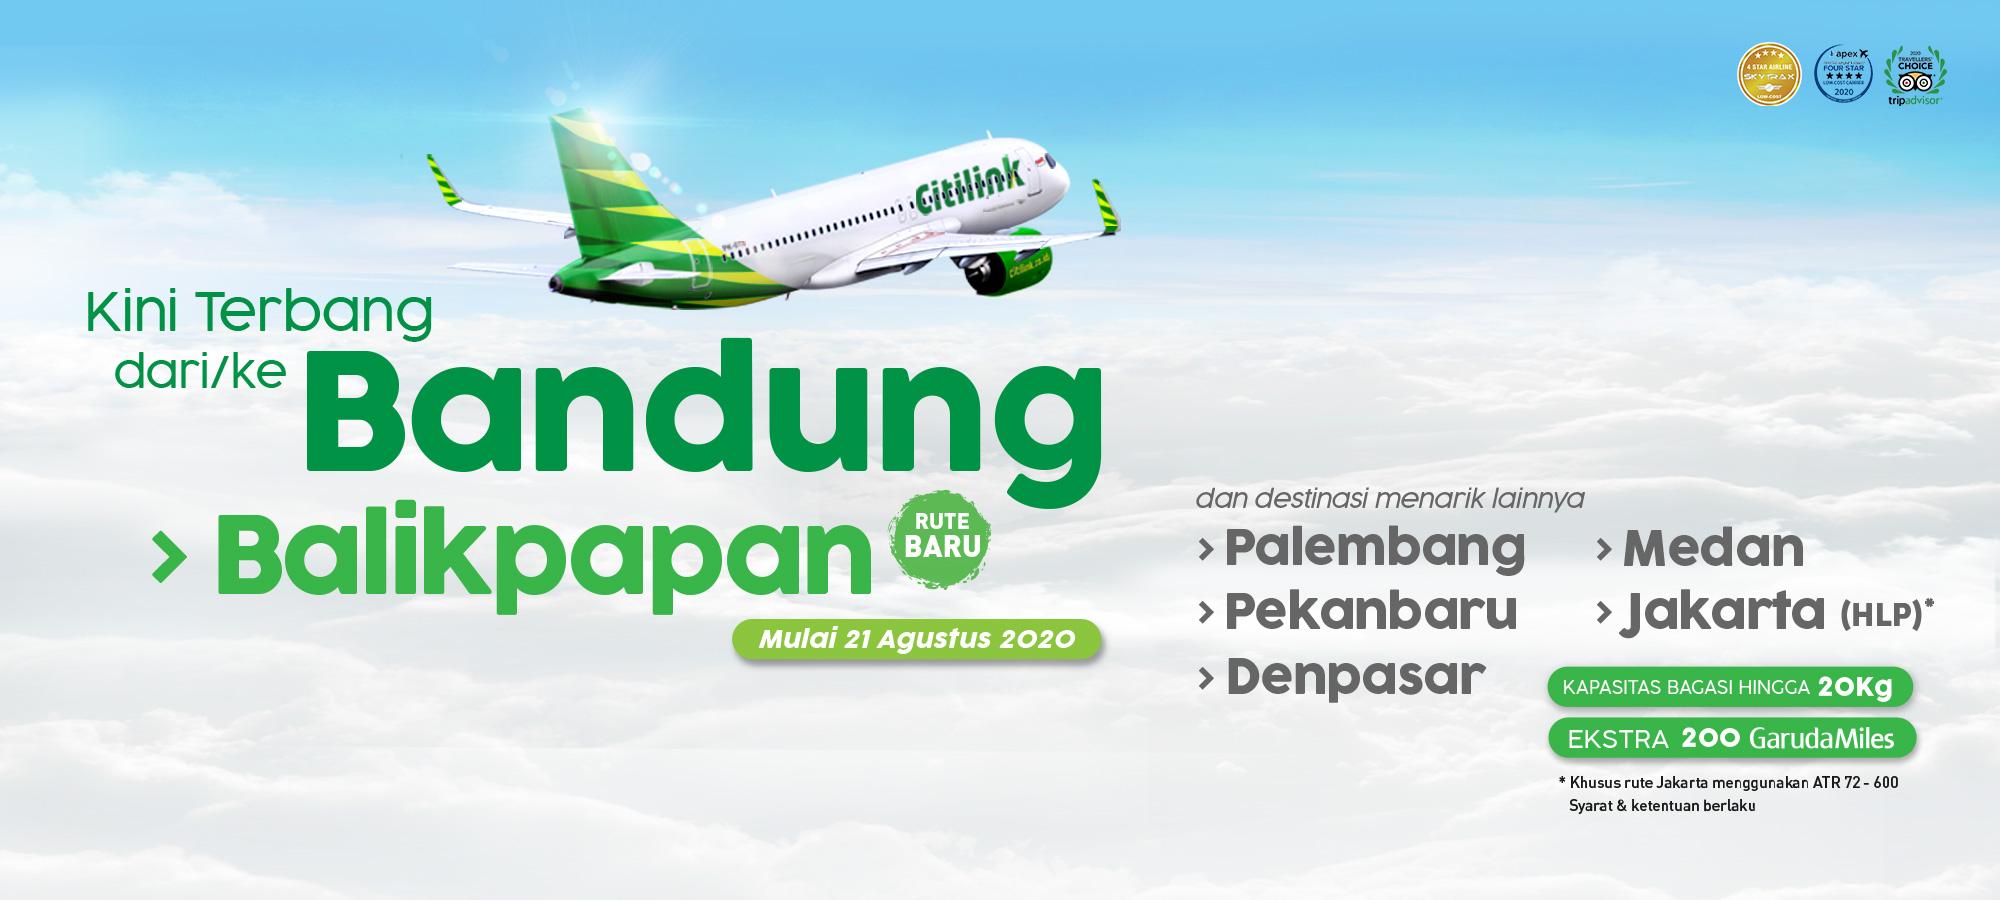 Citilink Terbang Dari Ke Bandung Balikpapan